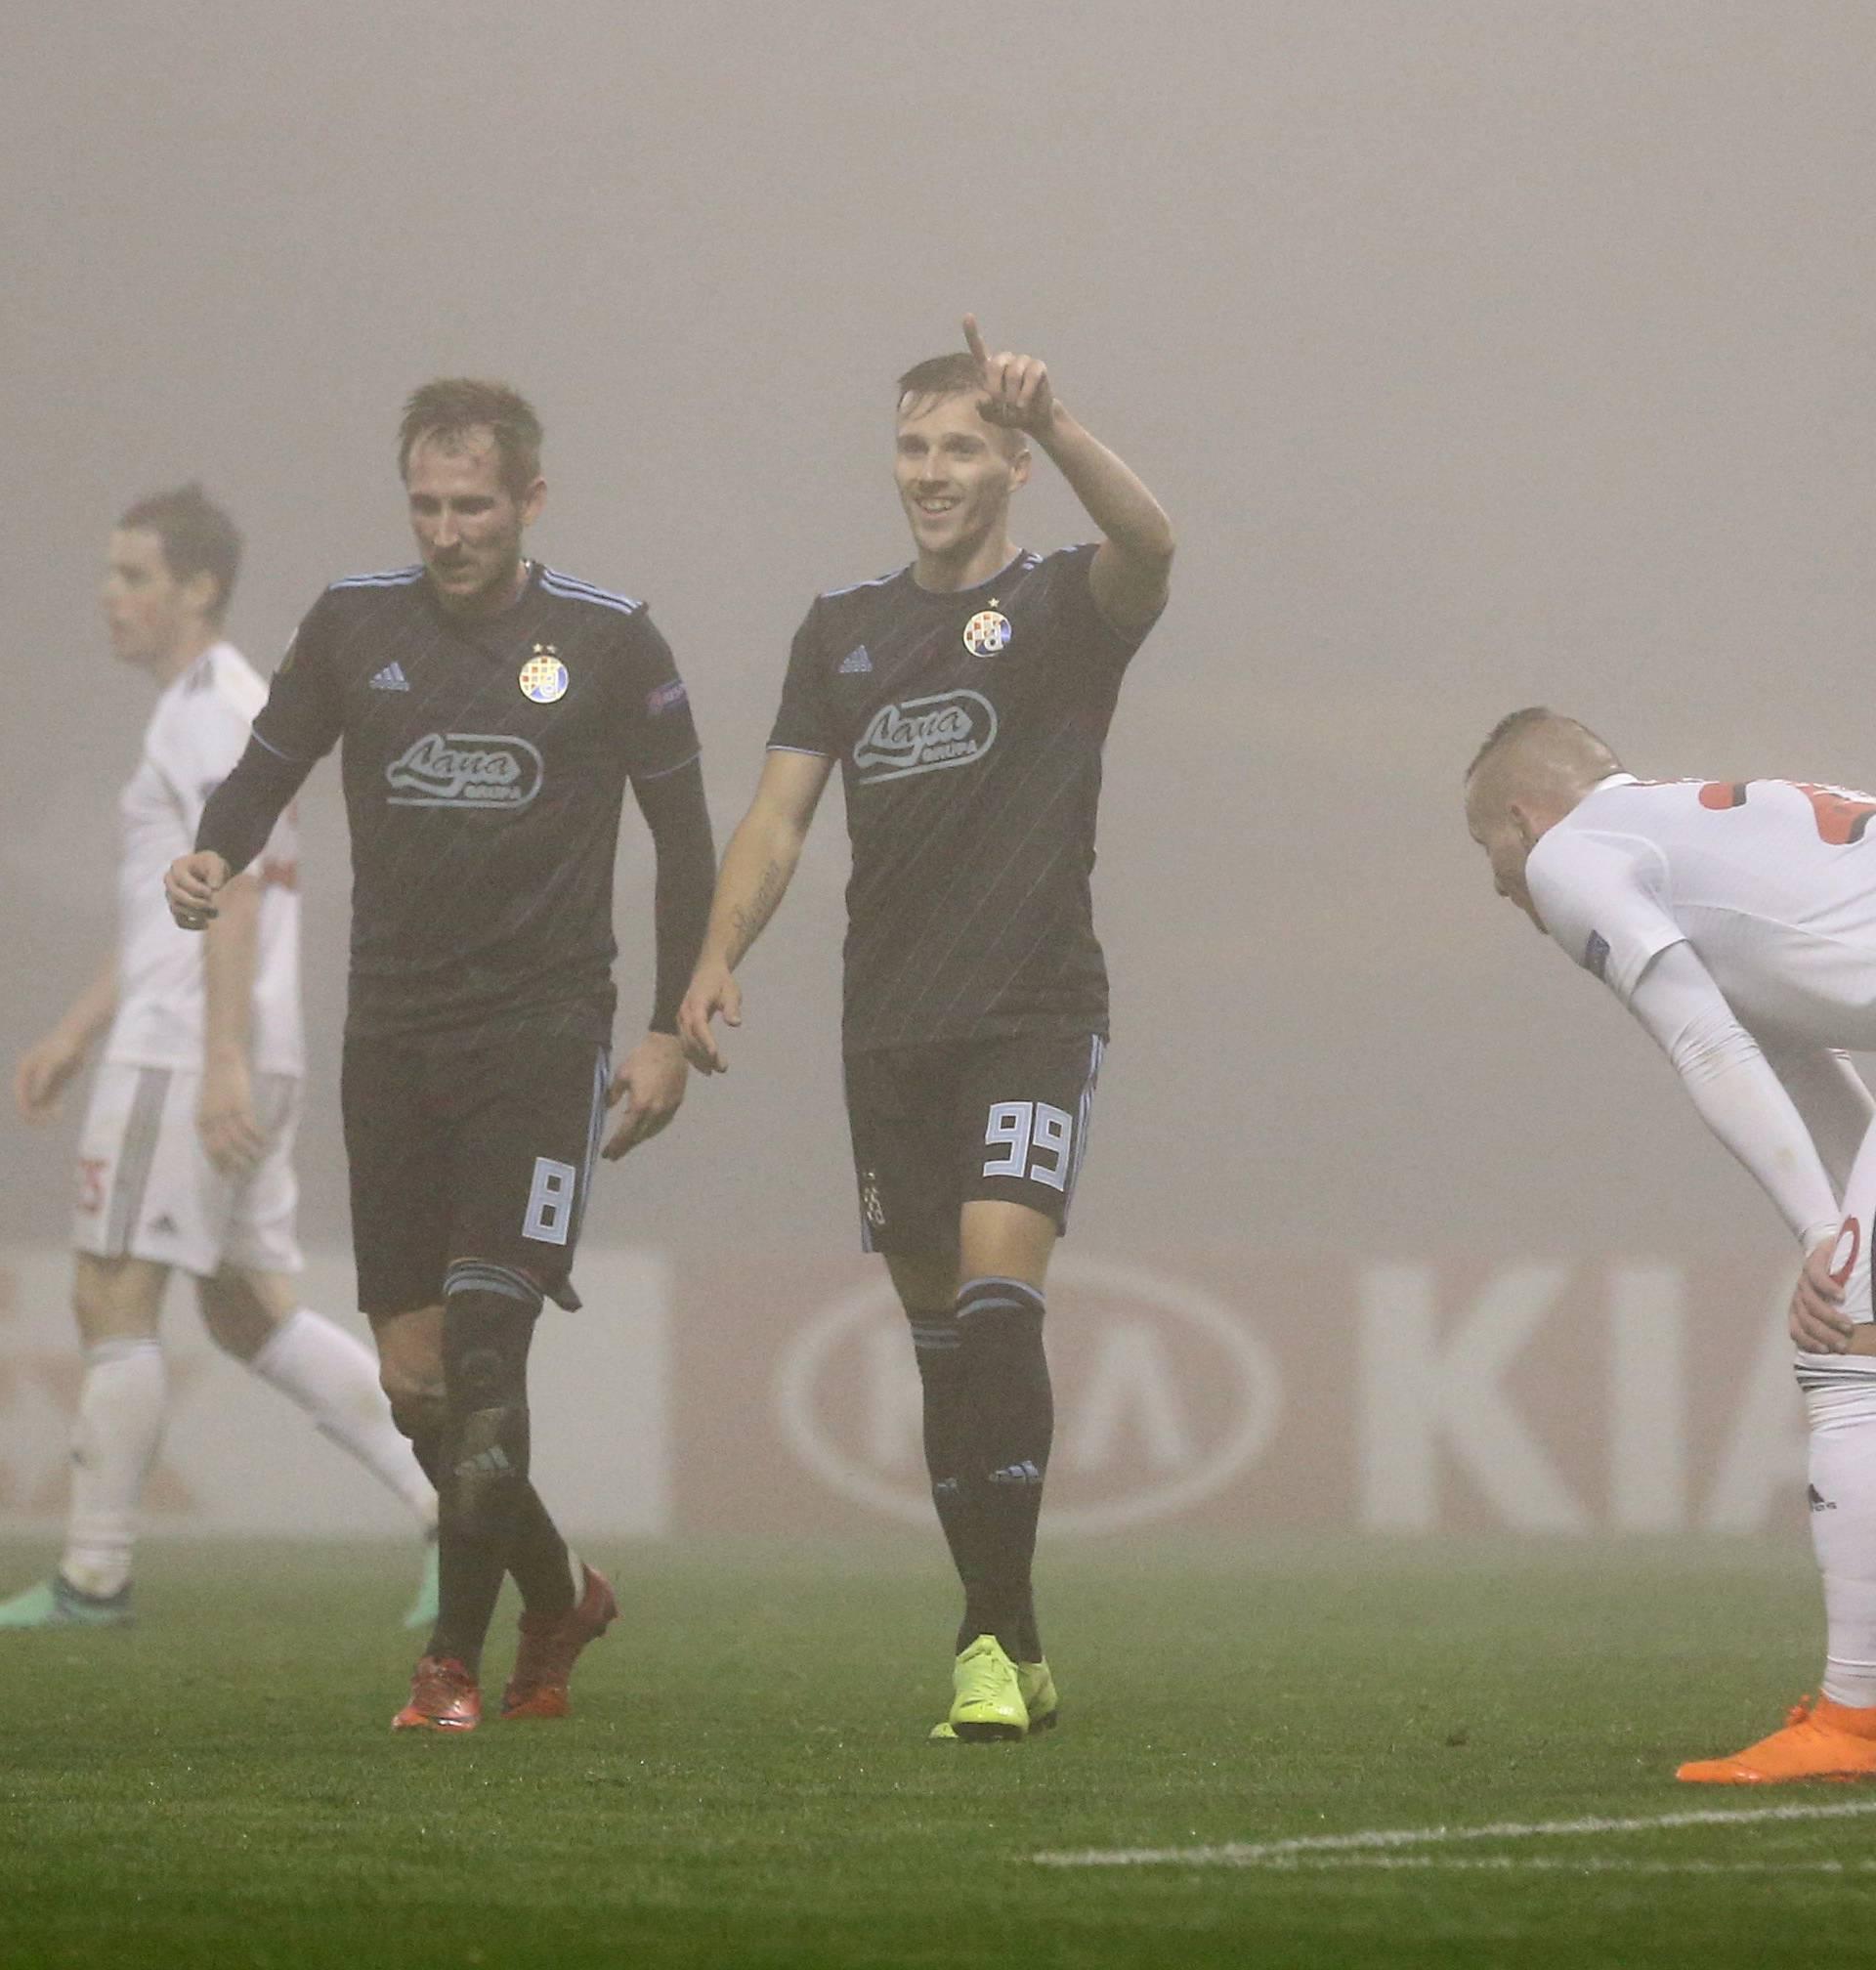 Europa League - Group Stage - Group D - GNK Dinamo Zagreb v Spartak Trnava